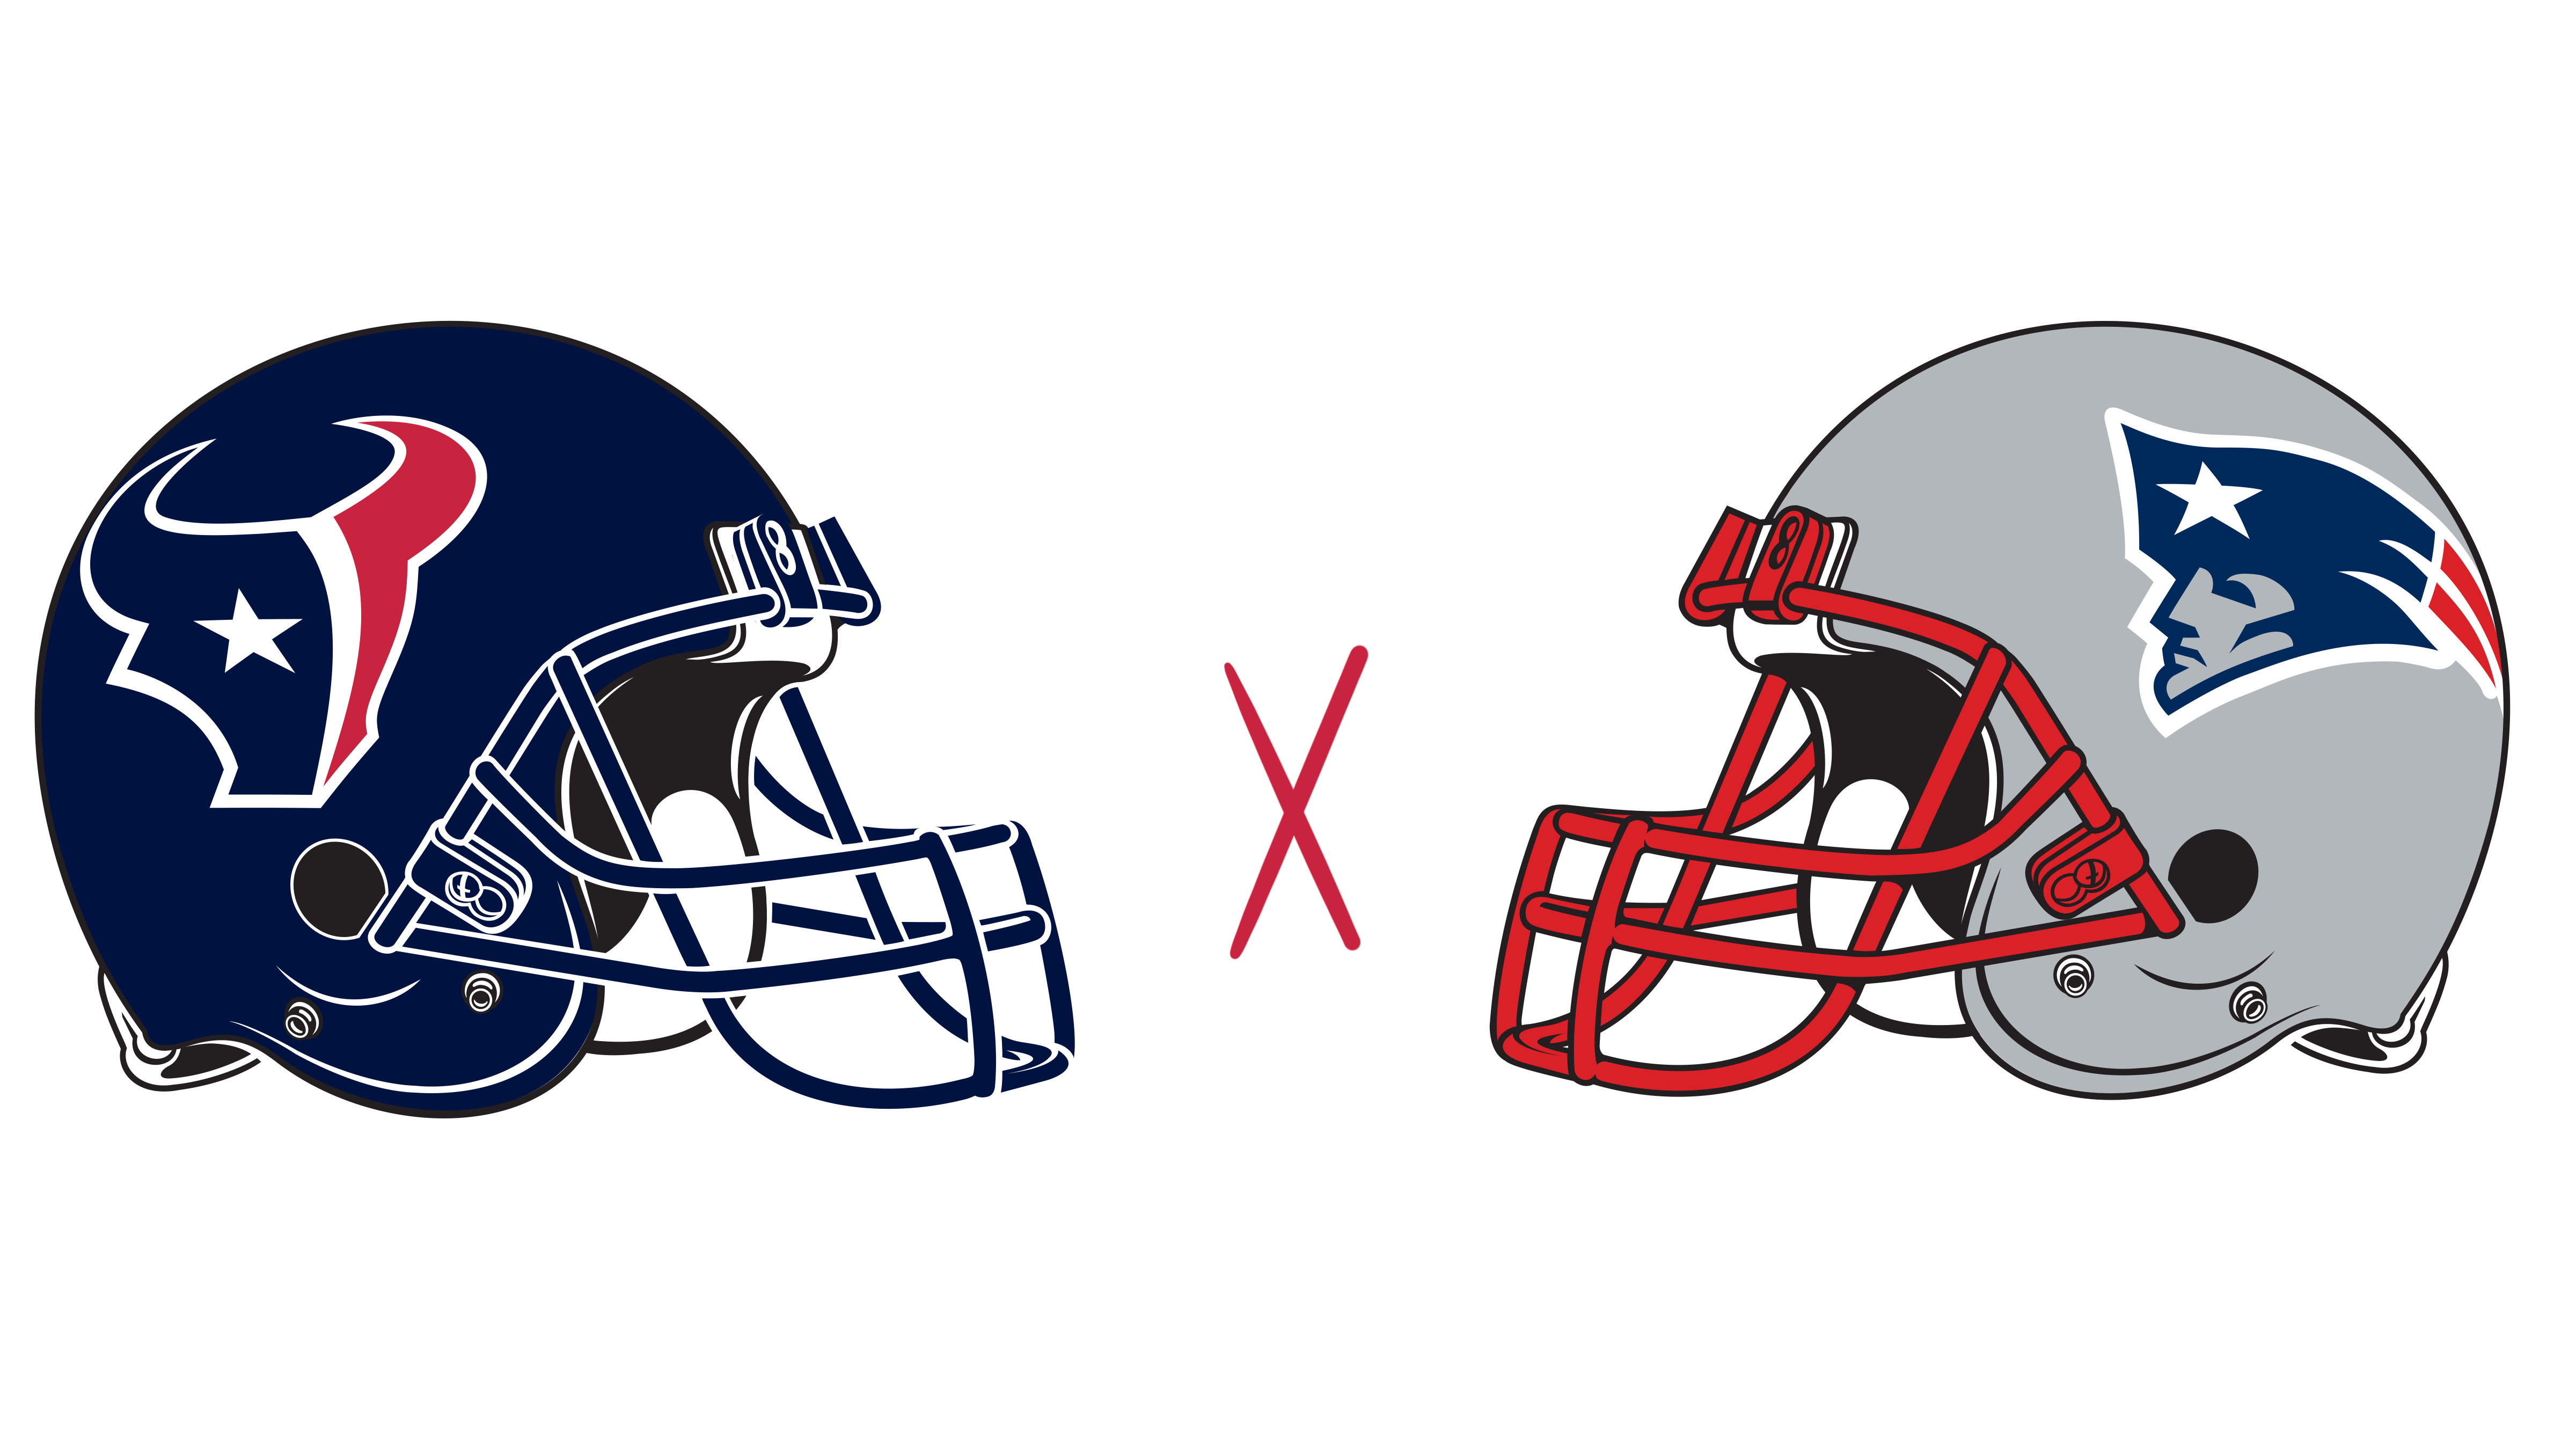 Houston Texans helmet and New England Patriots helmet